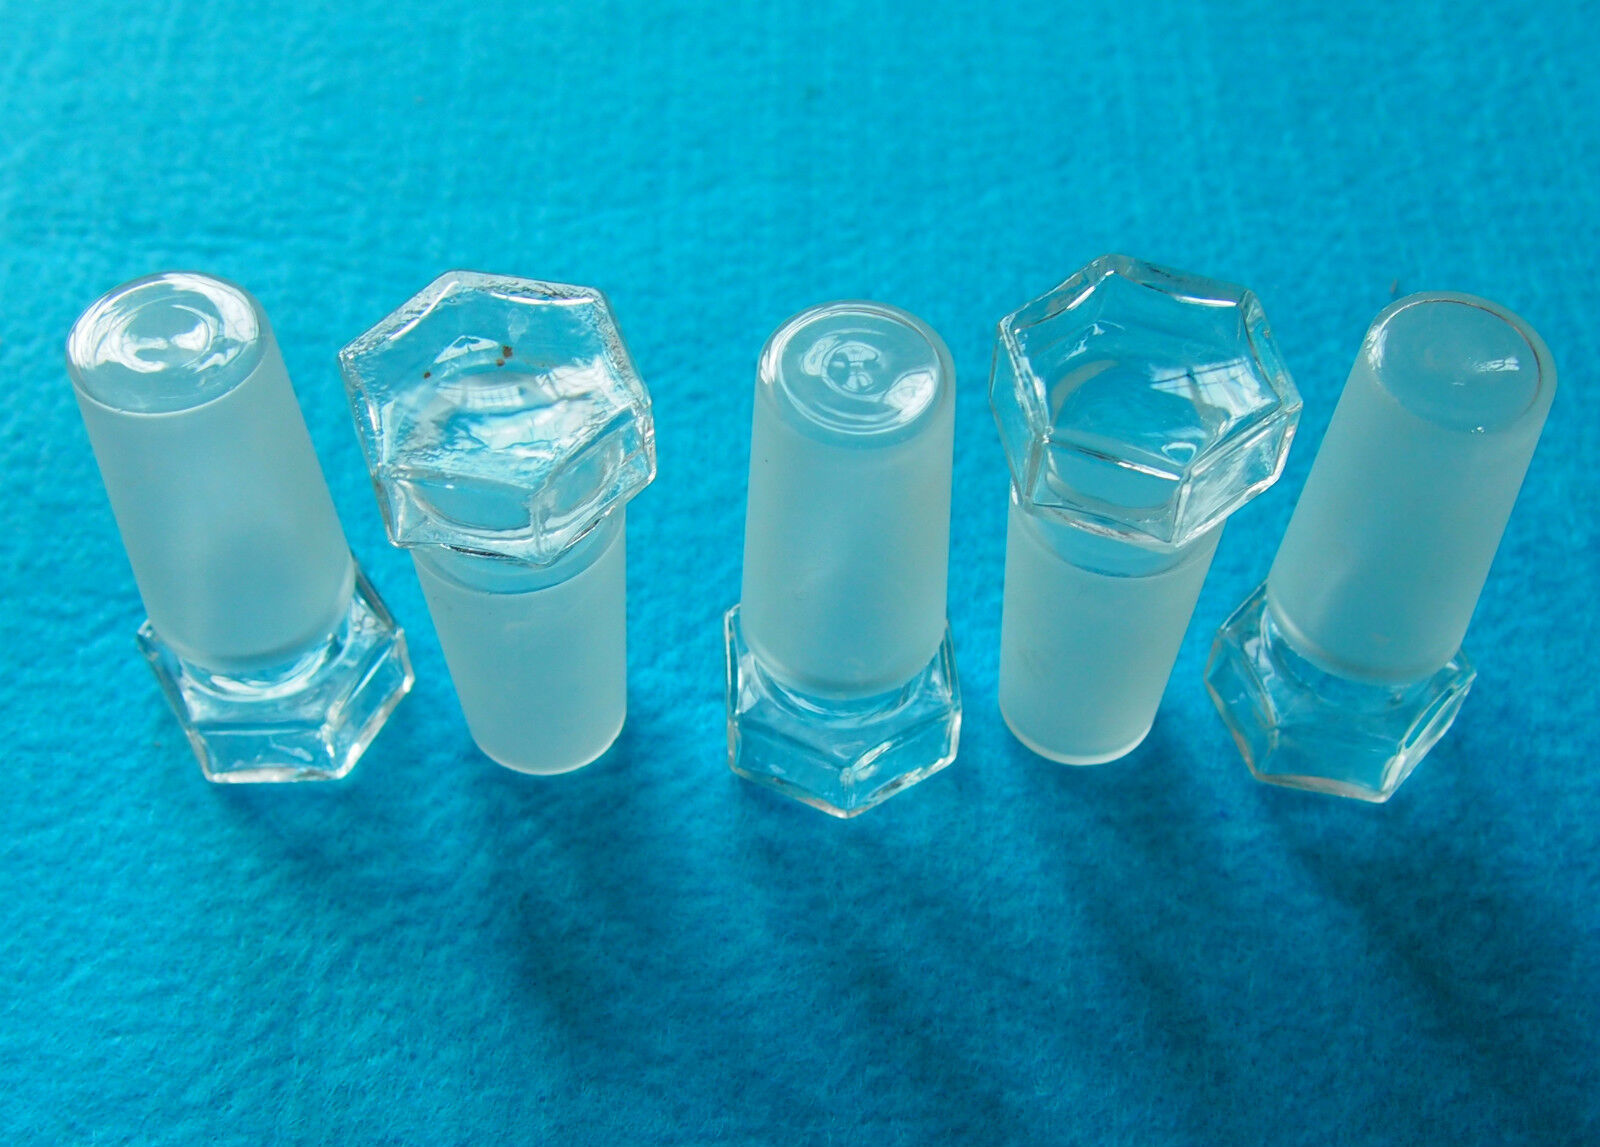 24/40,Glass Stopper,5 Pcs/Lot,Lab Bottle Plug,Laboratory Chemistry Glassware 3